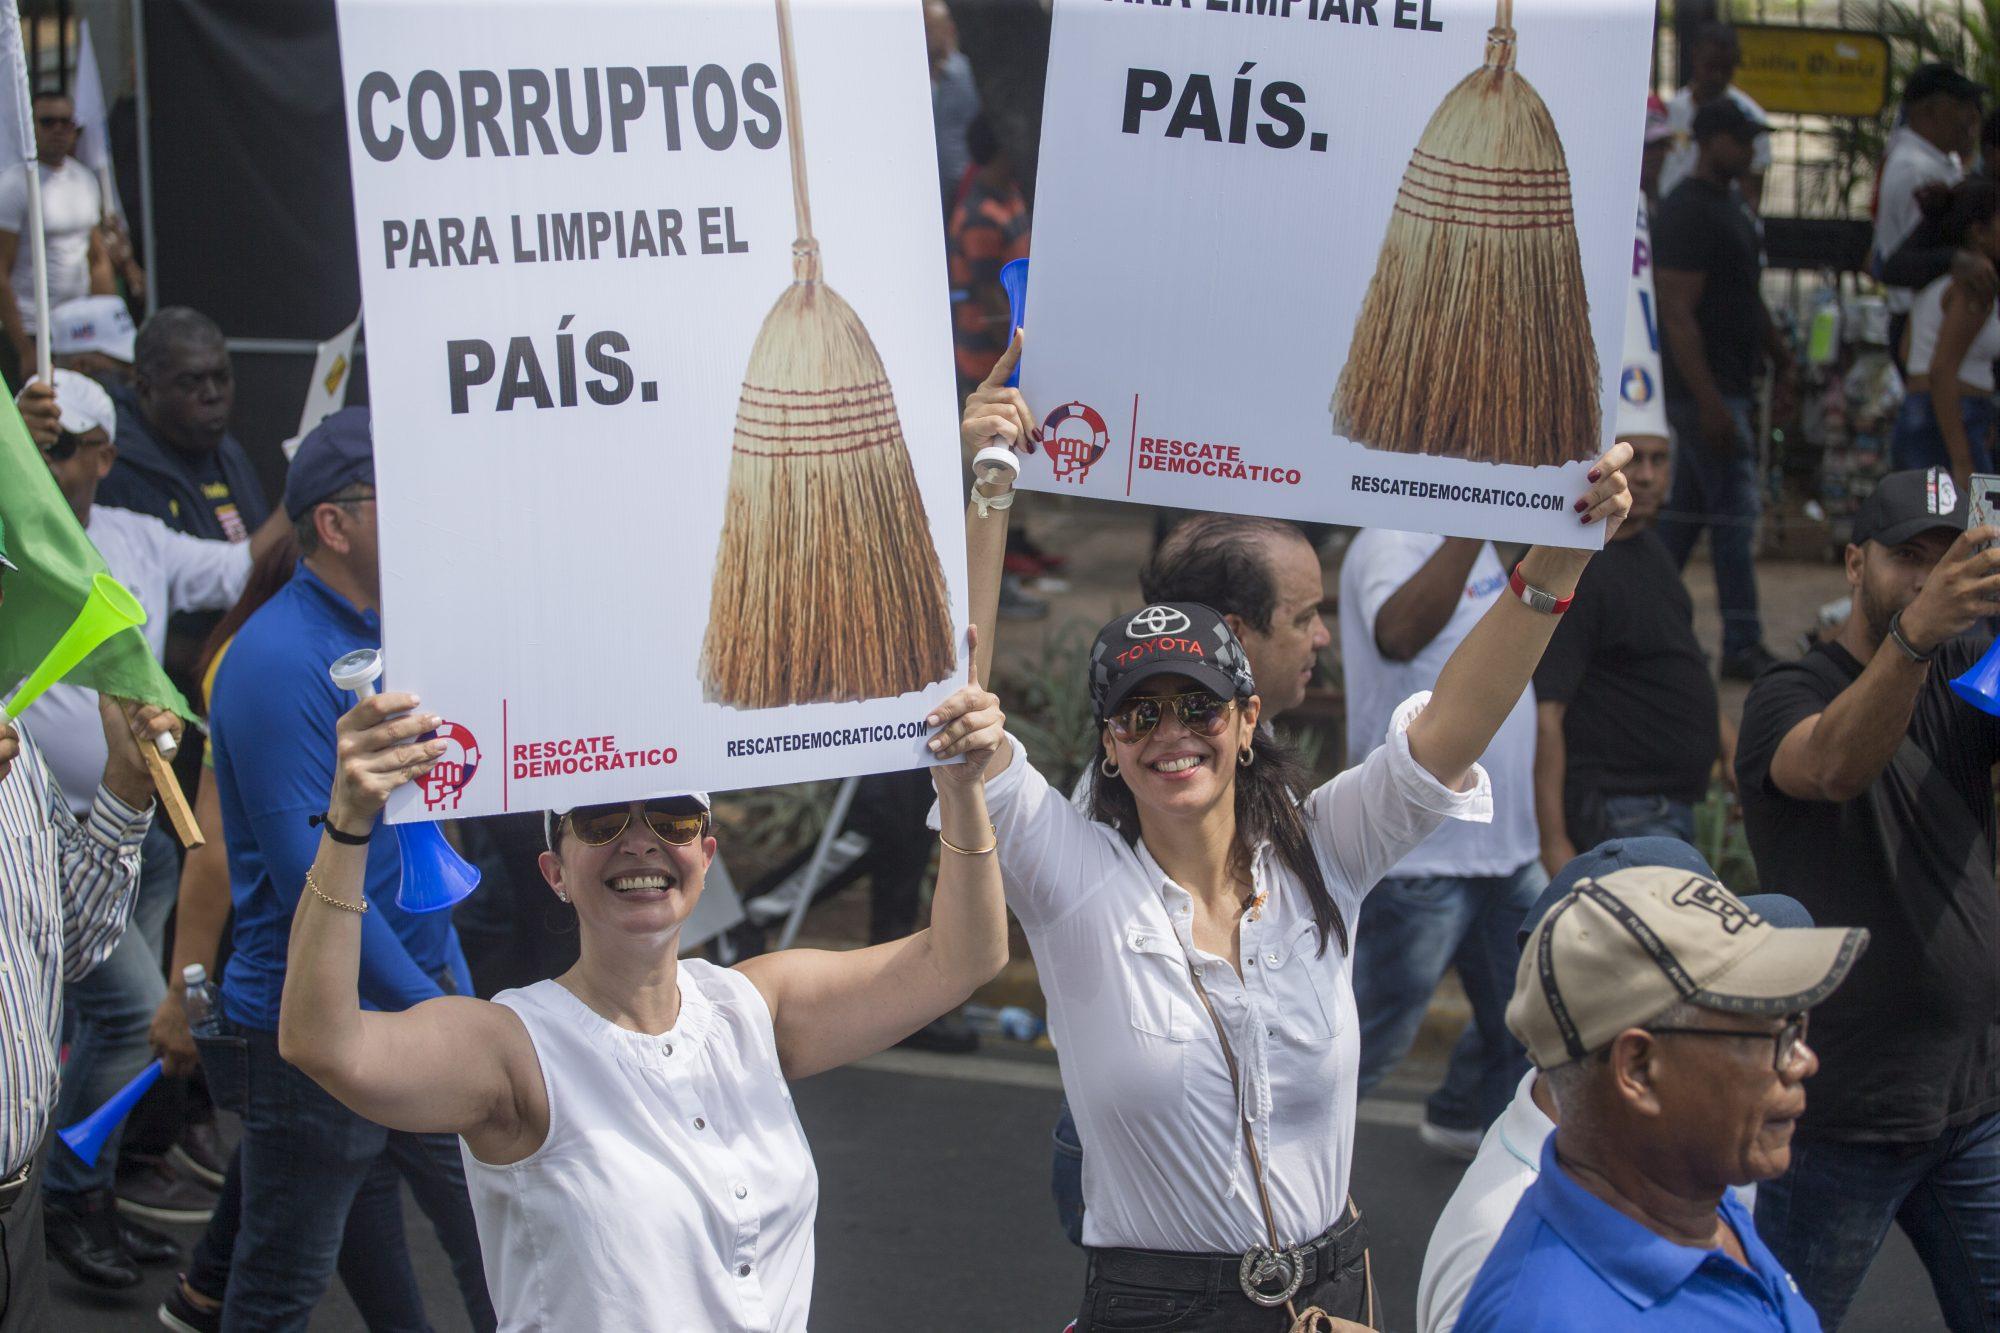 DOMINICAN REP-MUNICIPAL-ELECTION-SUSPENSION-PROTEST